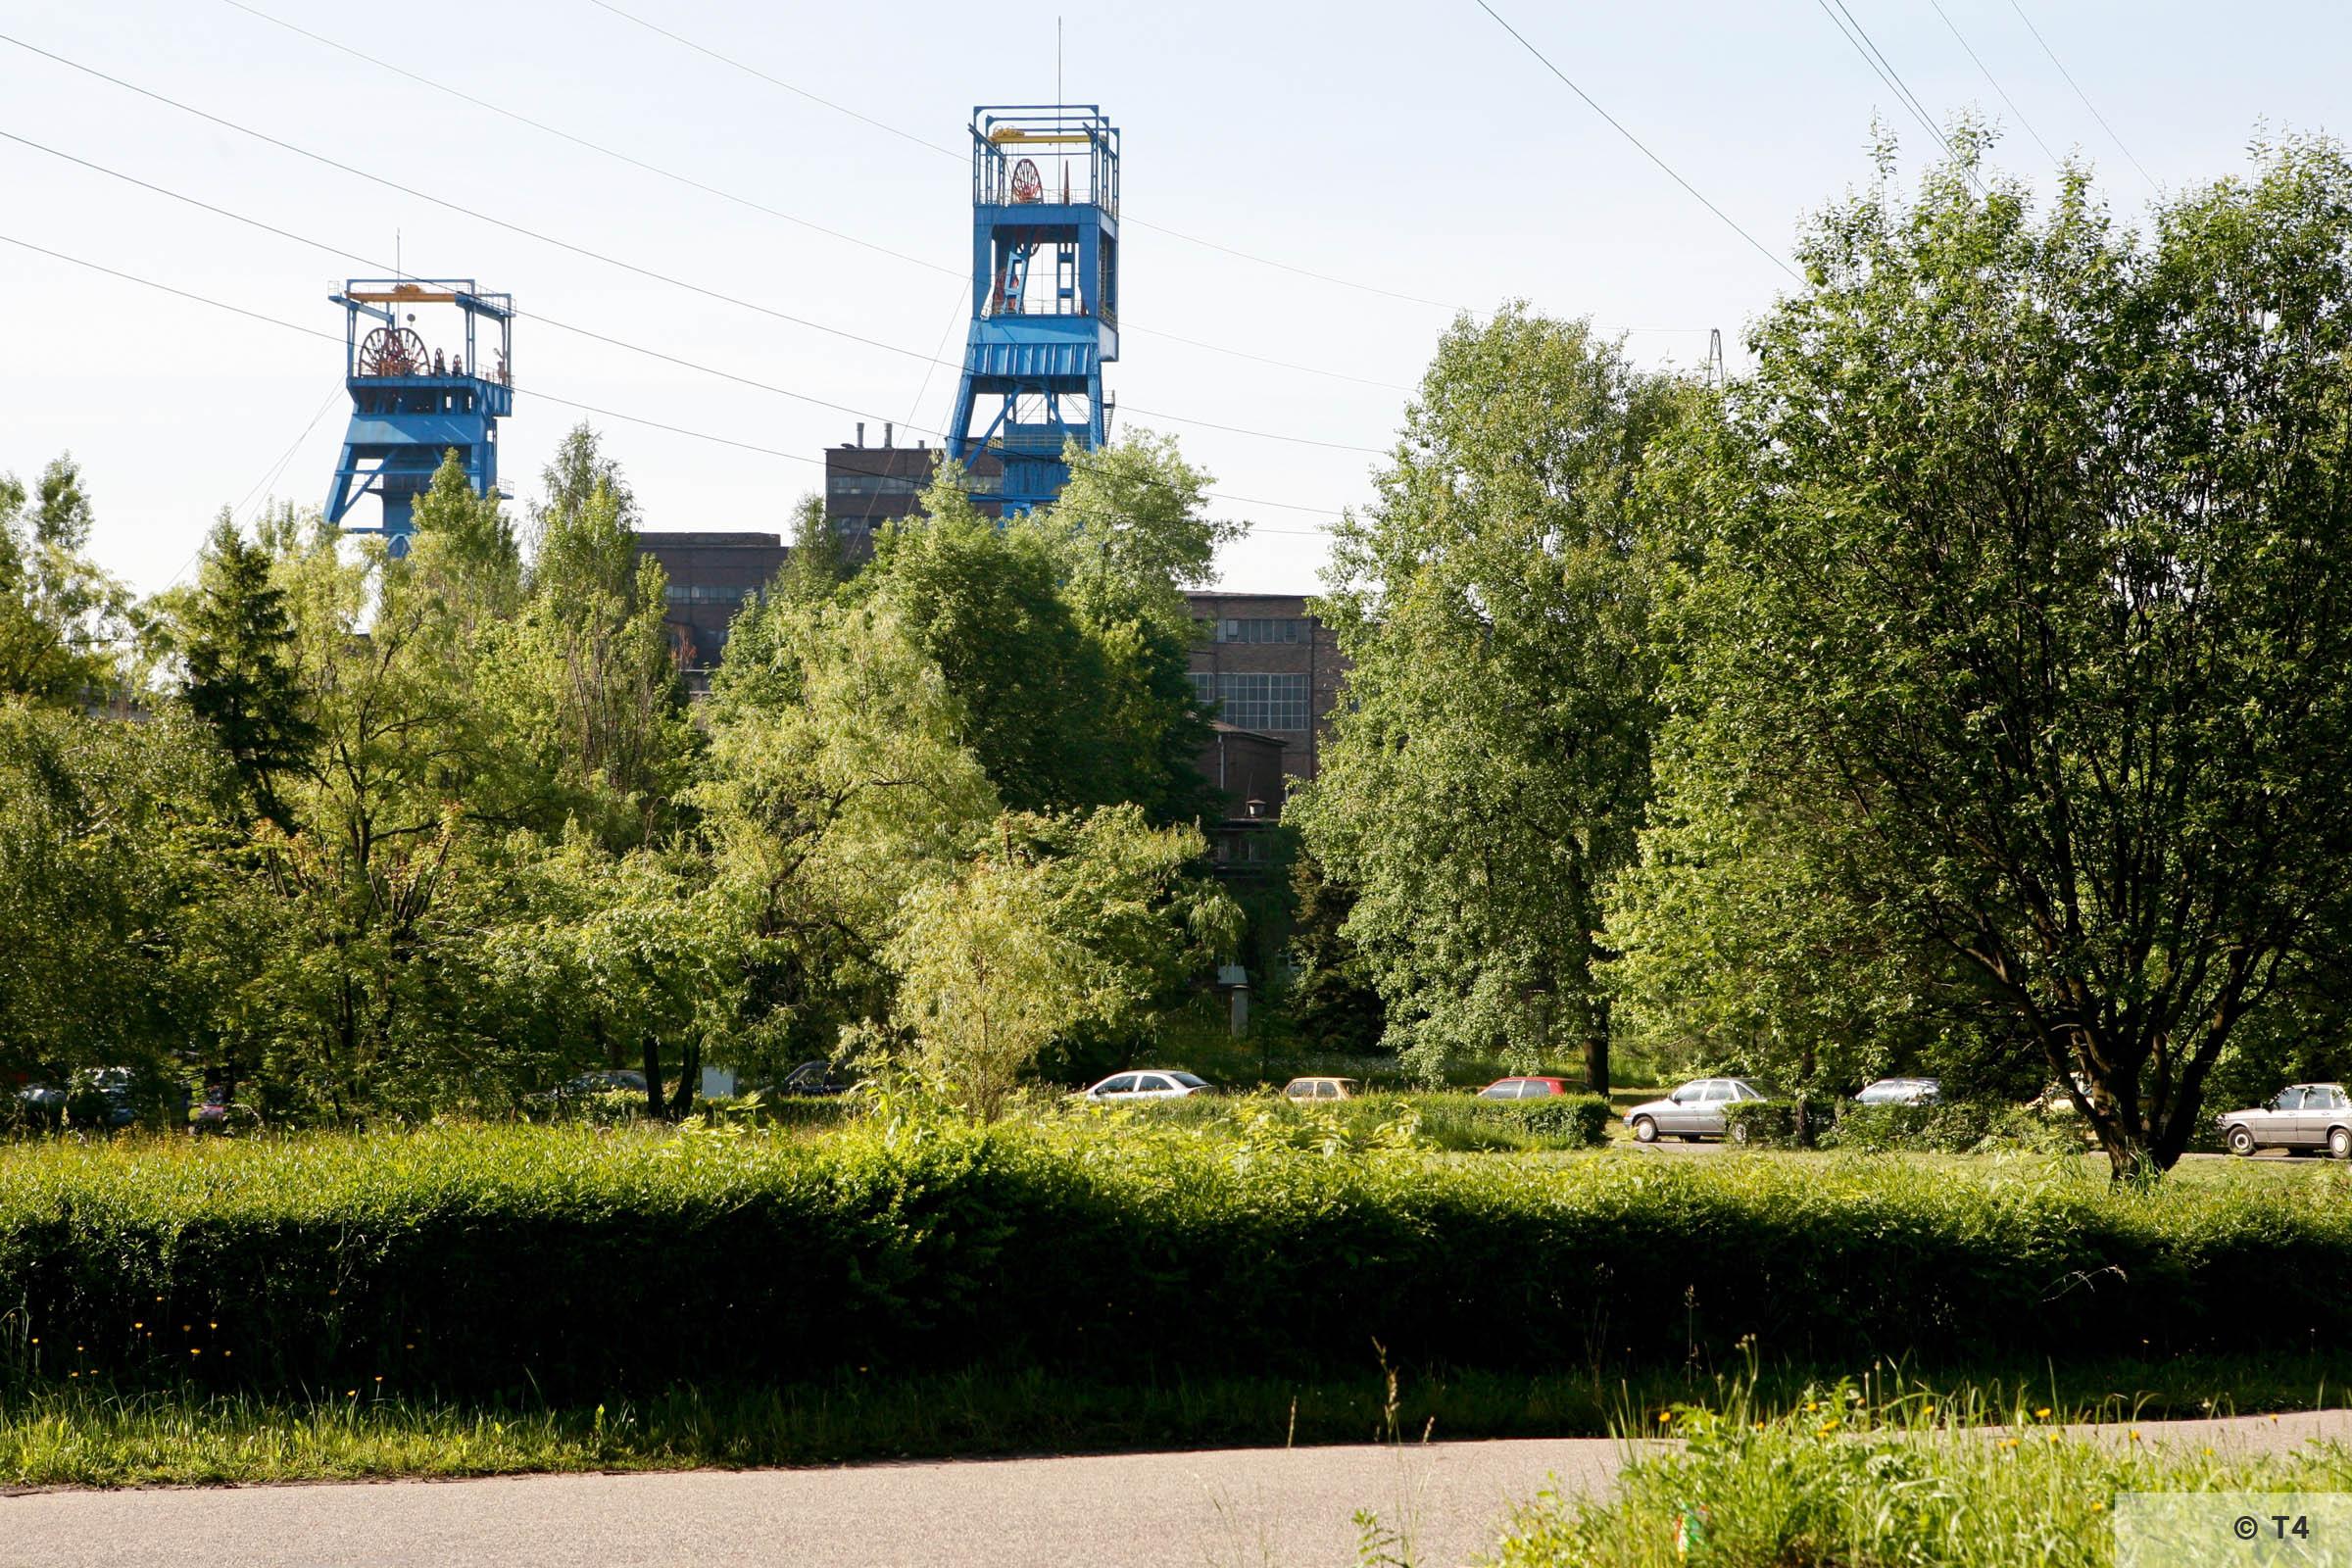 Wesola mine 2006. T4 6828